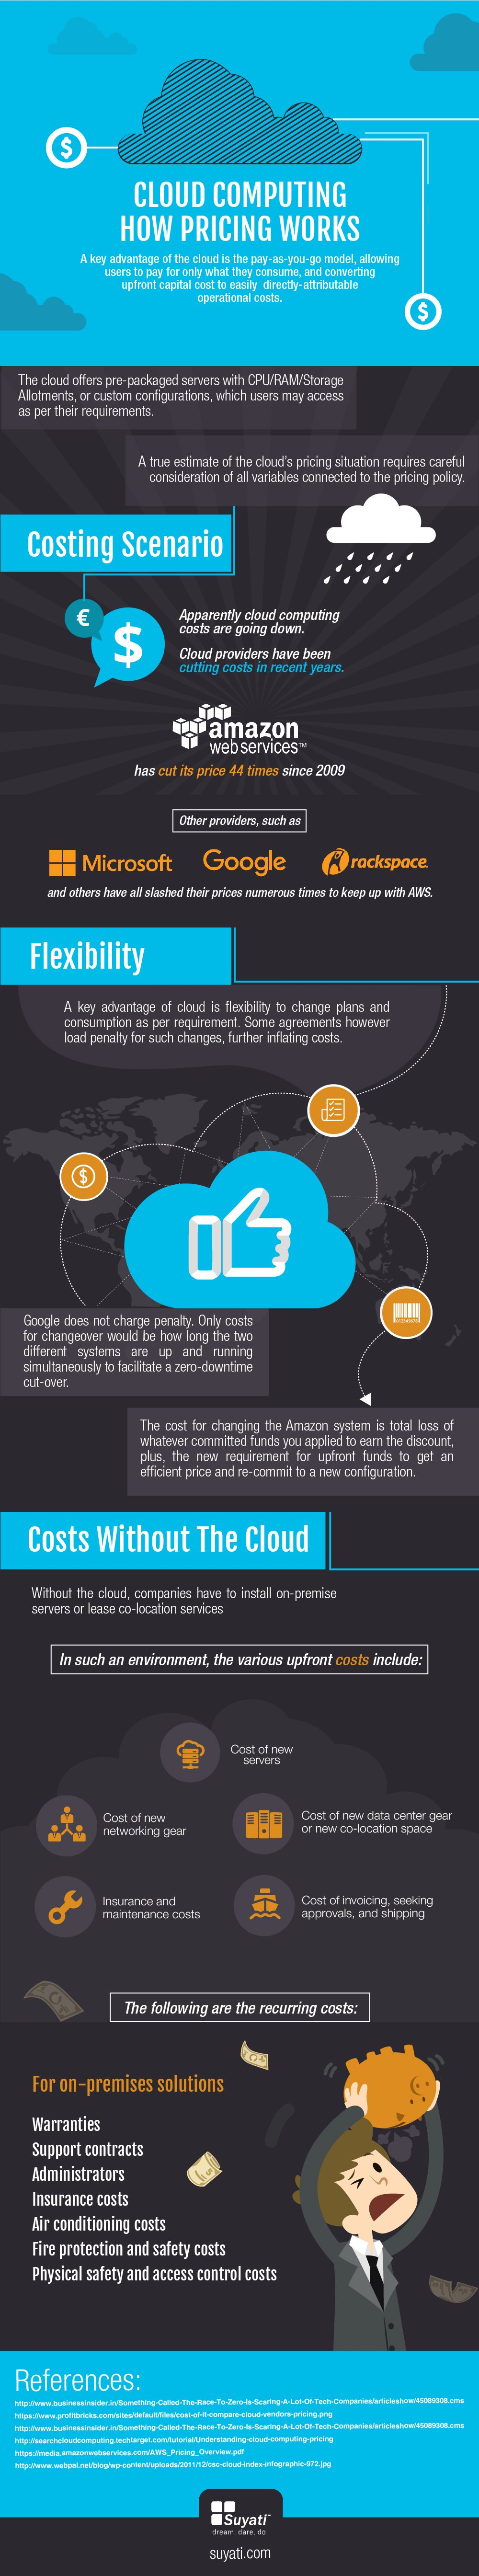 Cloud computing-infographic